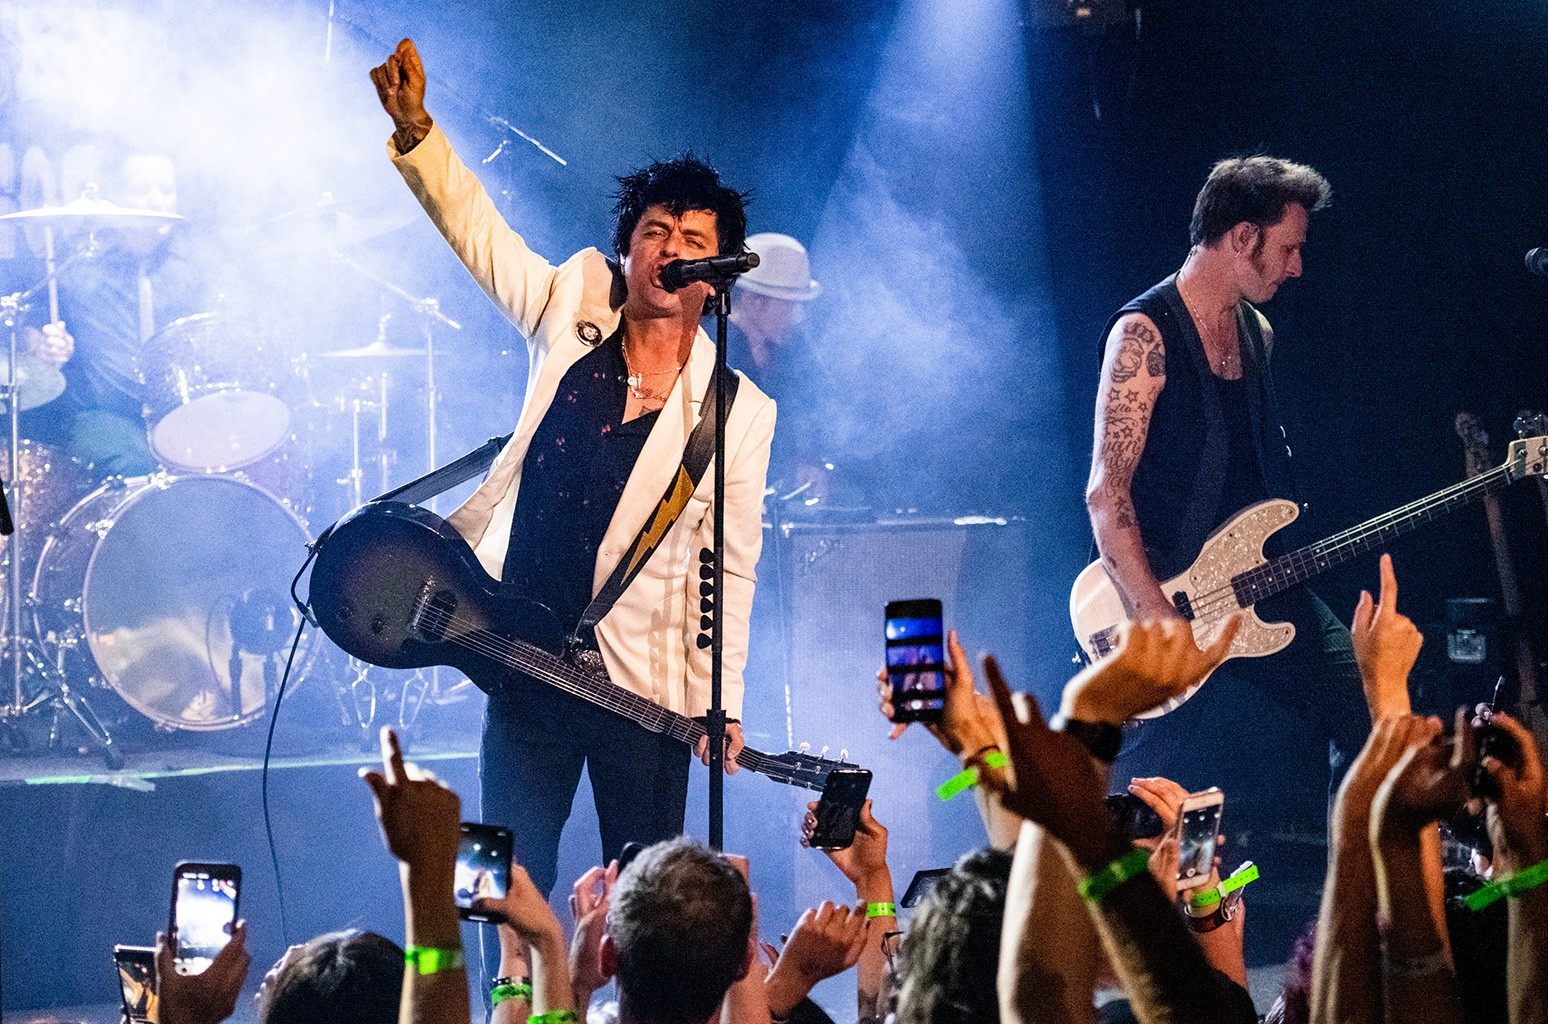 Green Day предлагает аэробику в стиле панк в видео 'Here Comes the Shock': смотреть